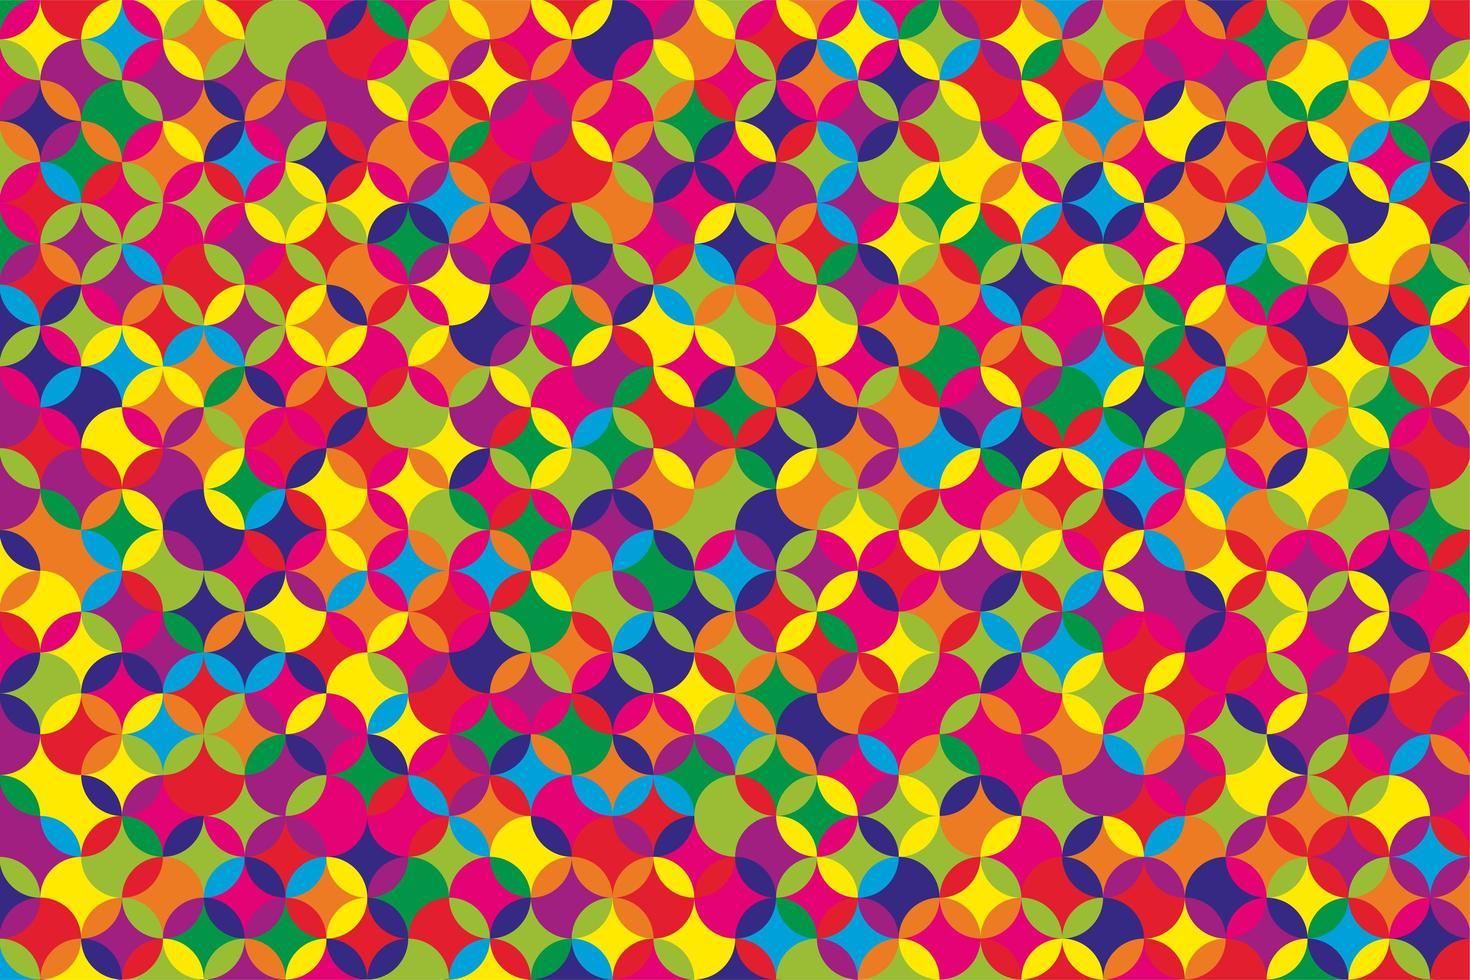 fundo de mosaico geométrico. vetor